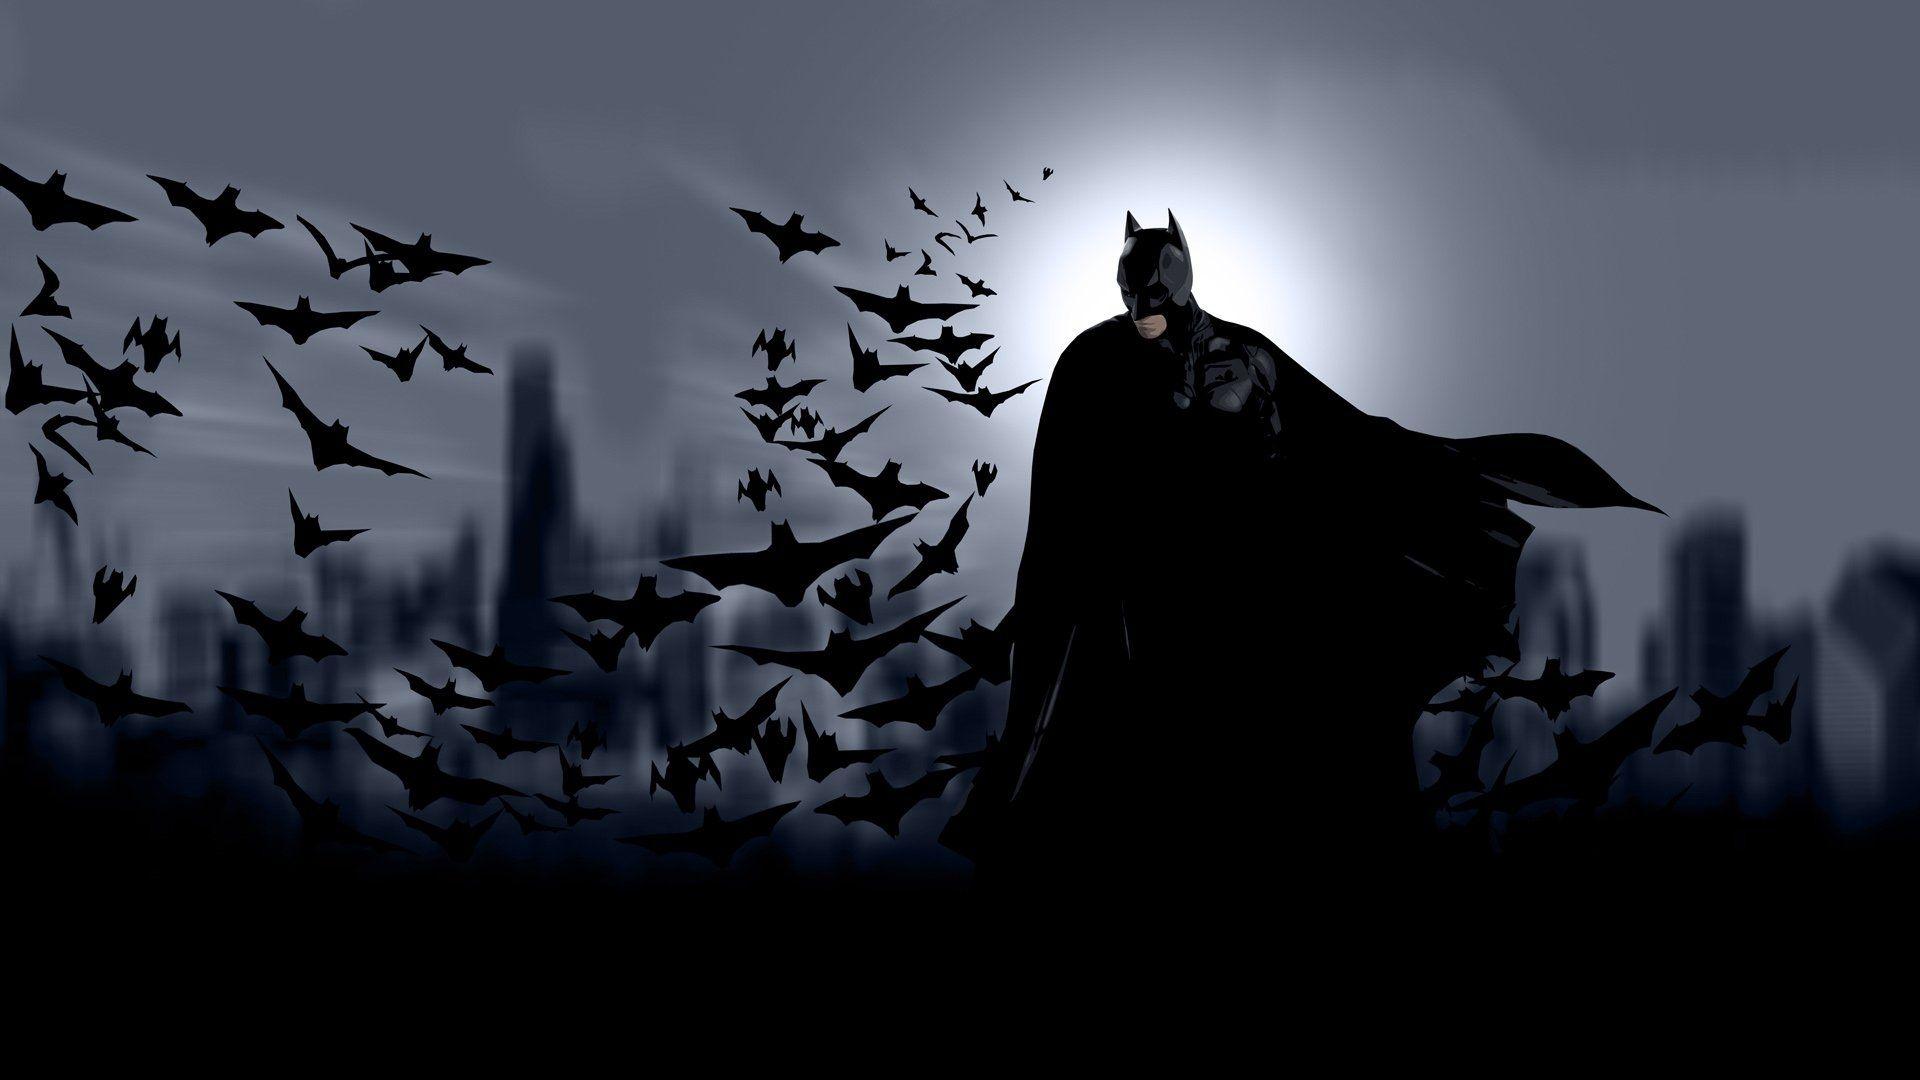 10 Latest Batman Desktop Wallpaper Hd Full Hd 1920 1080 For Pc Background Batman Backgrounds Batman Comic Wallpaper Hd Batman Wallpaper